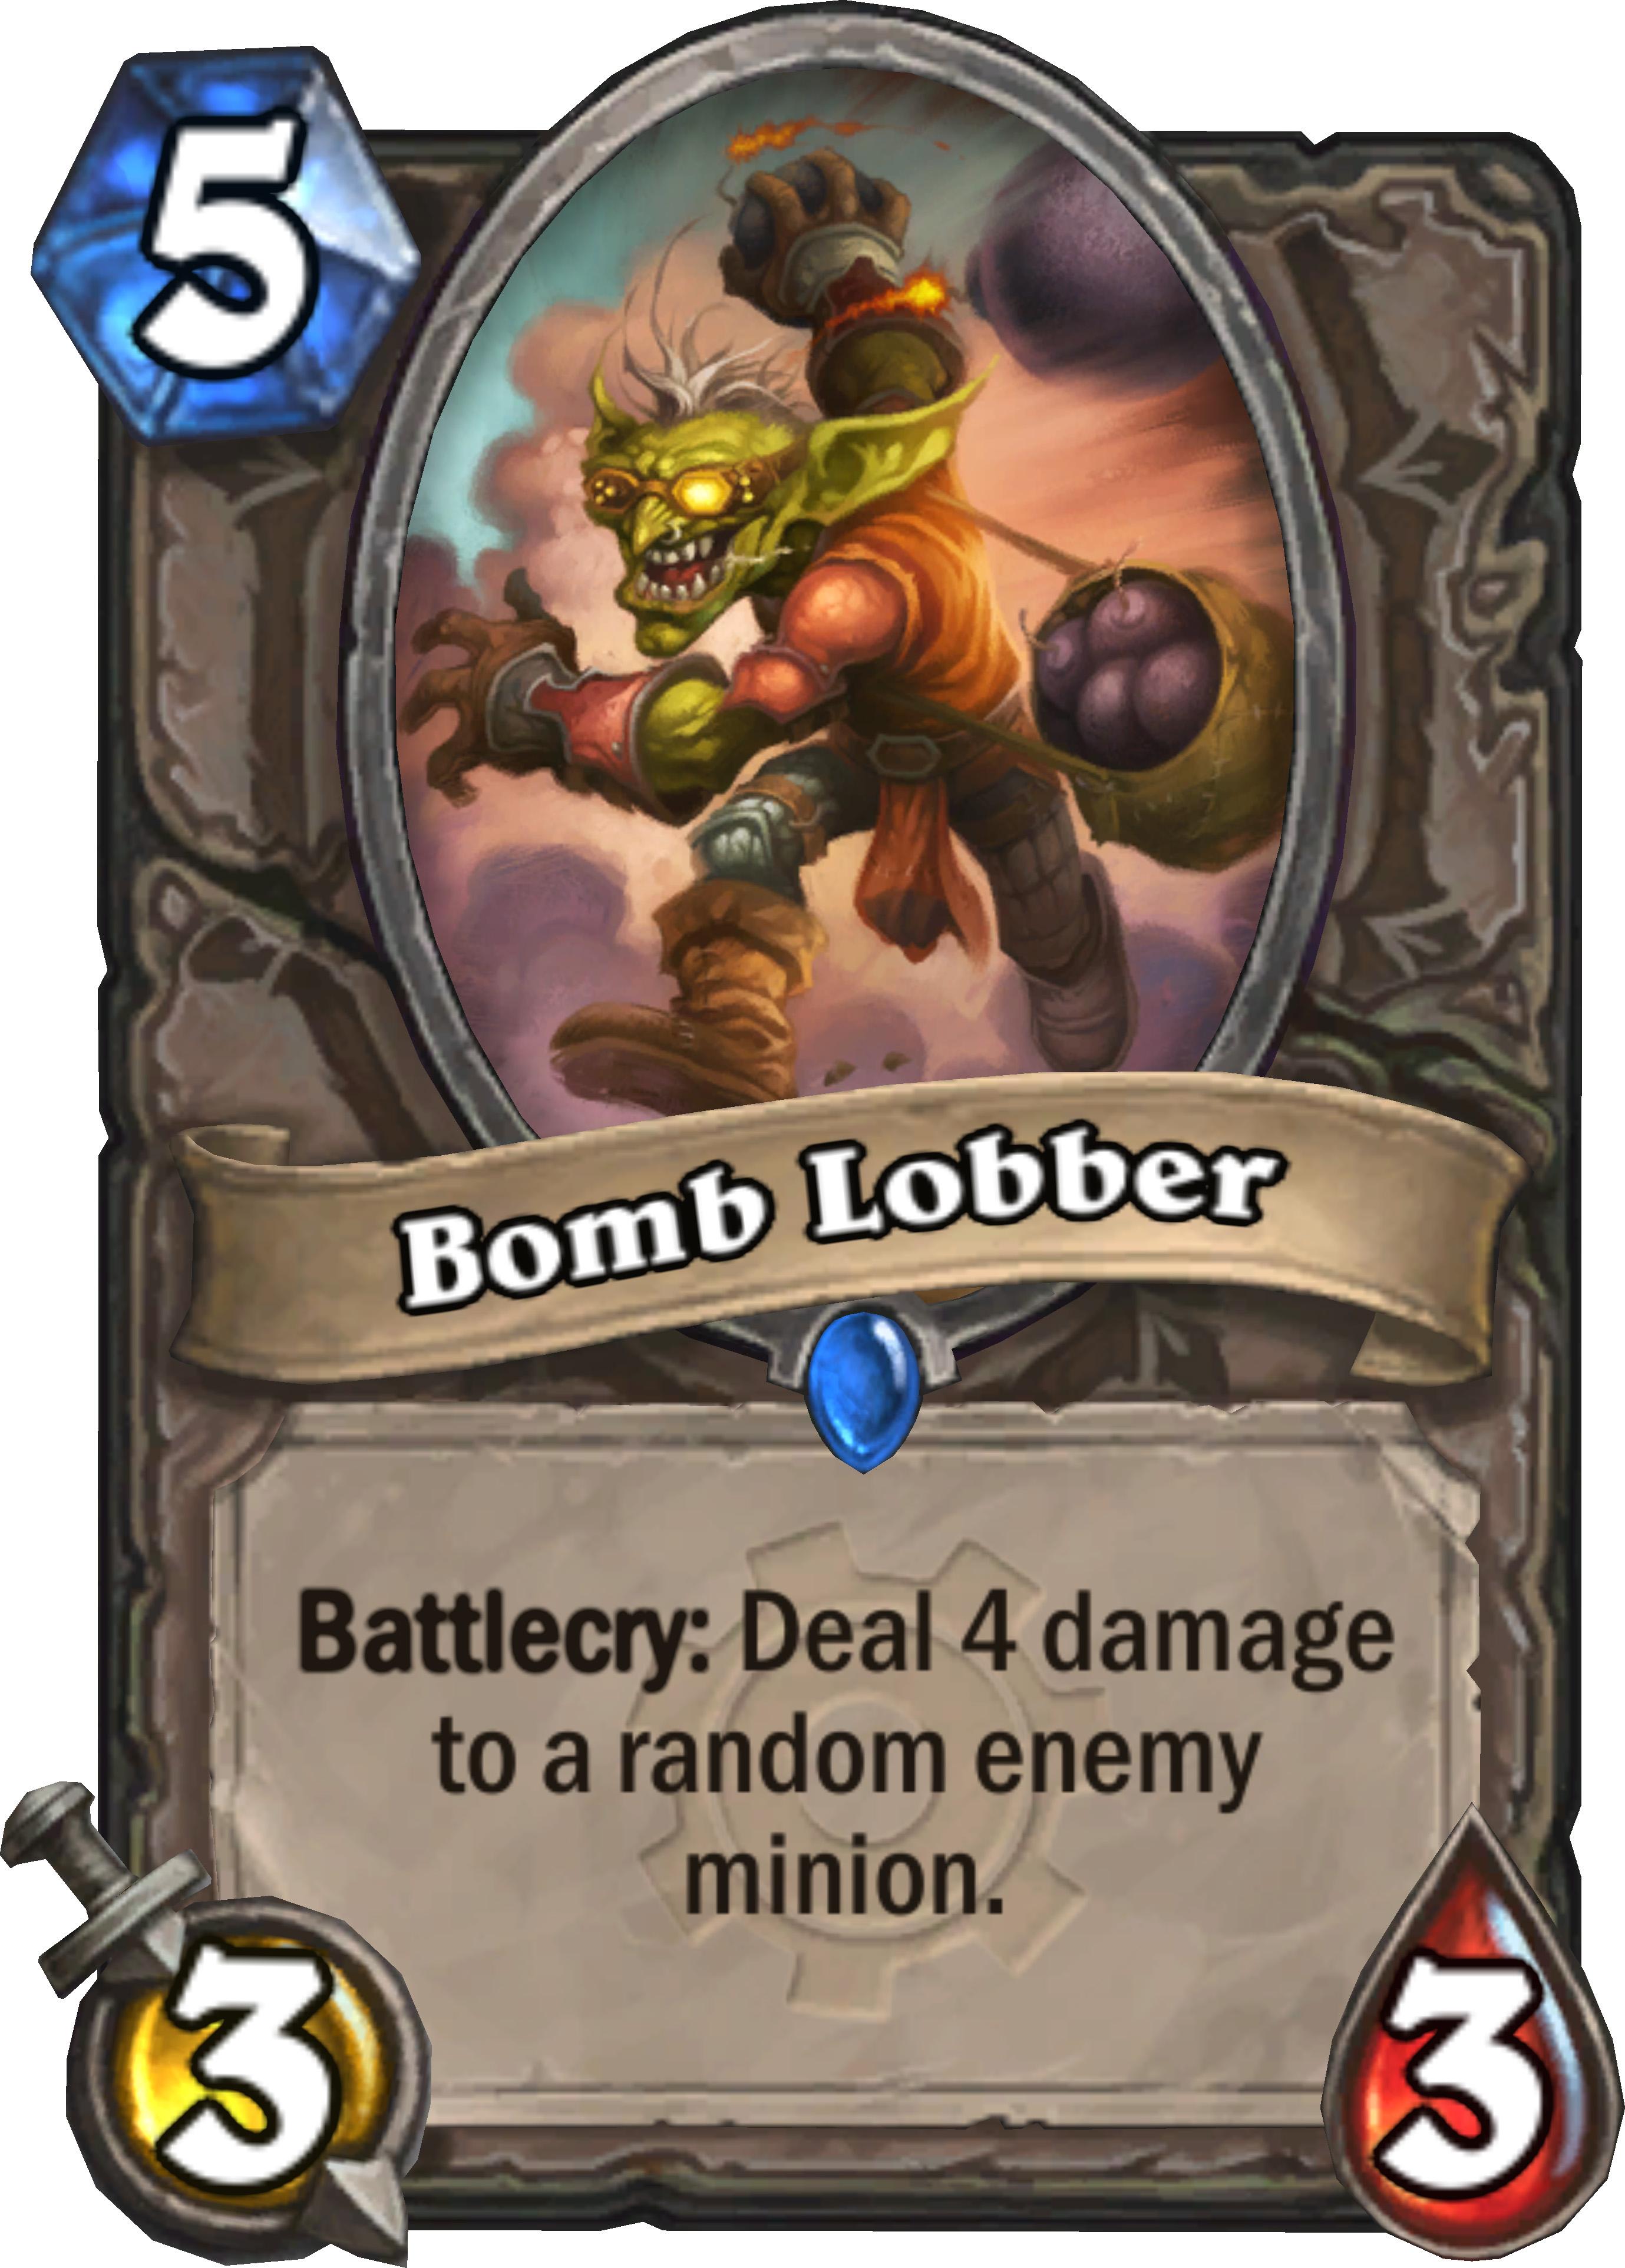 BOMB LOBBER